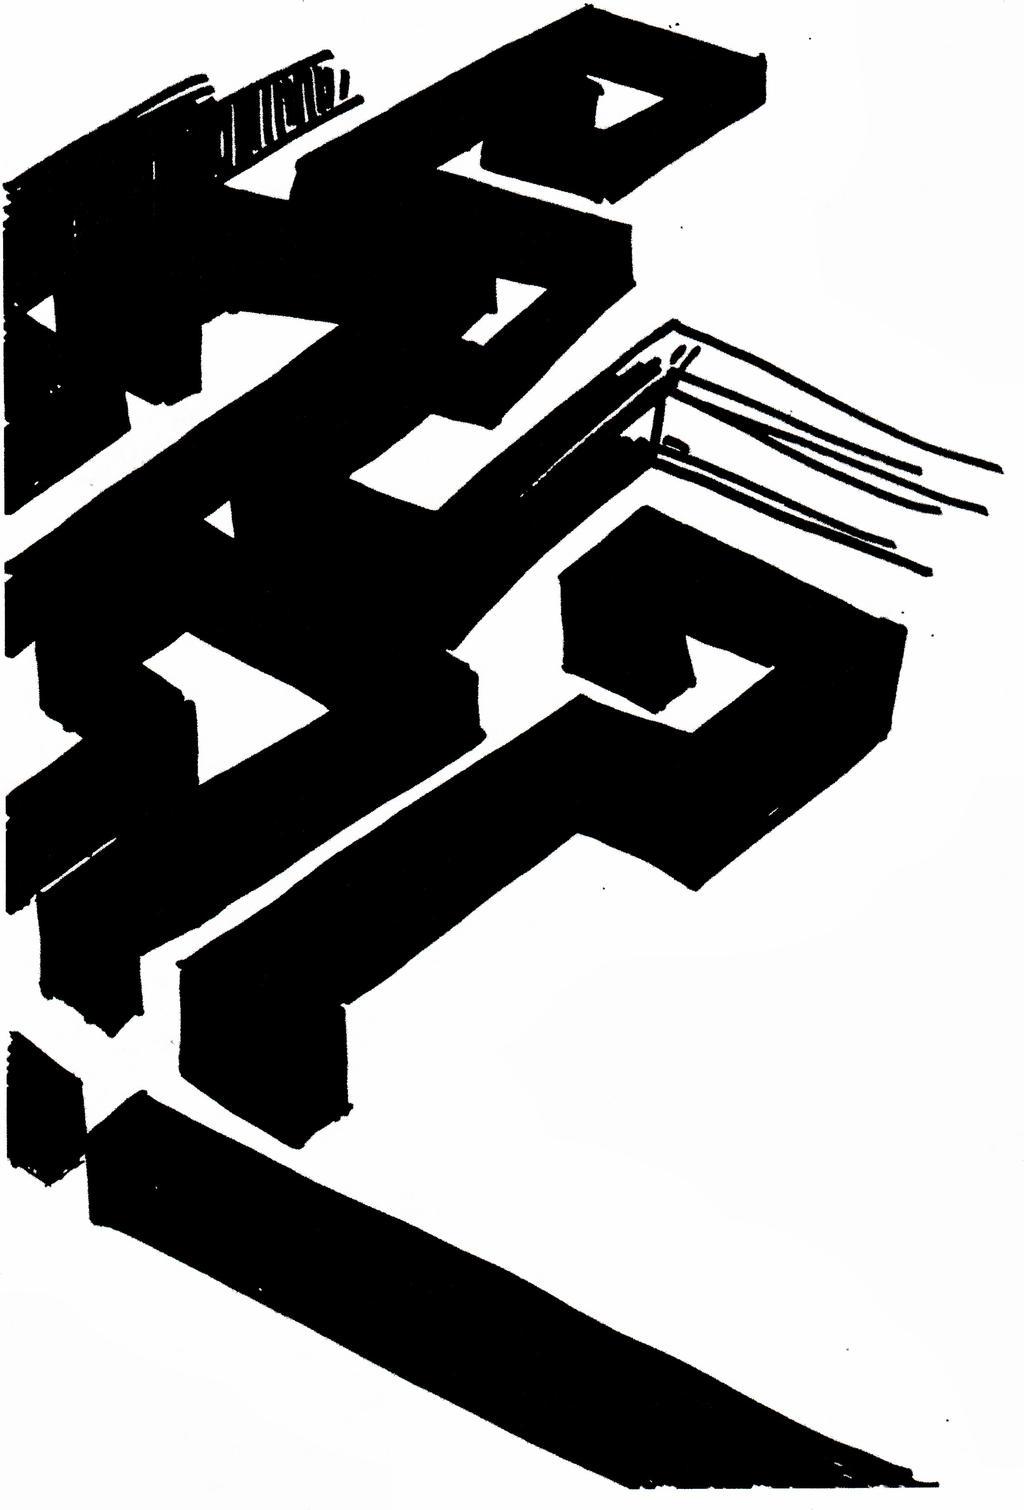 Labyrinthe by CassandreLucas